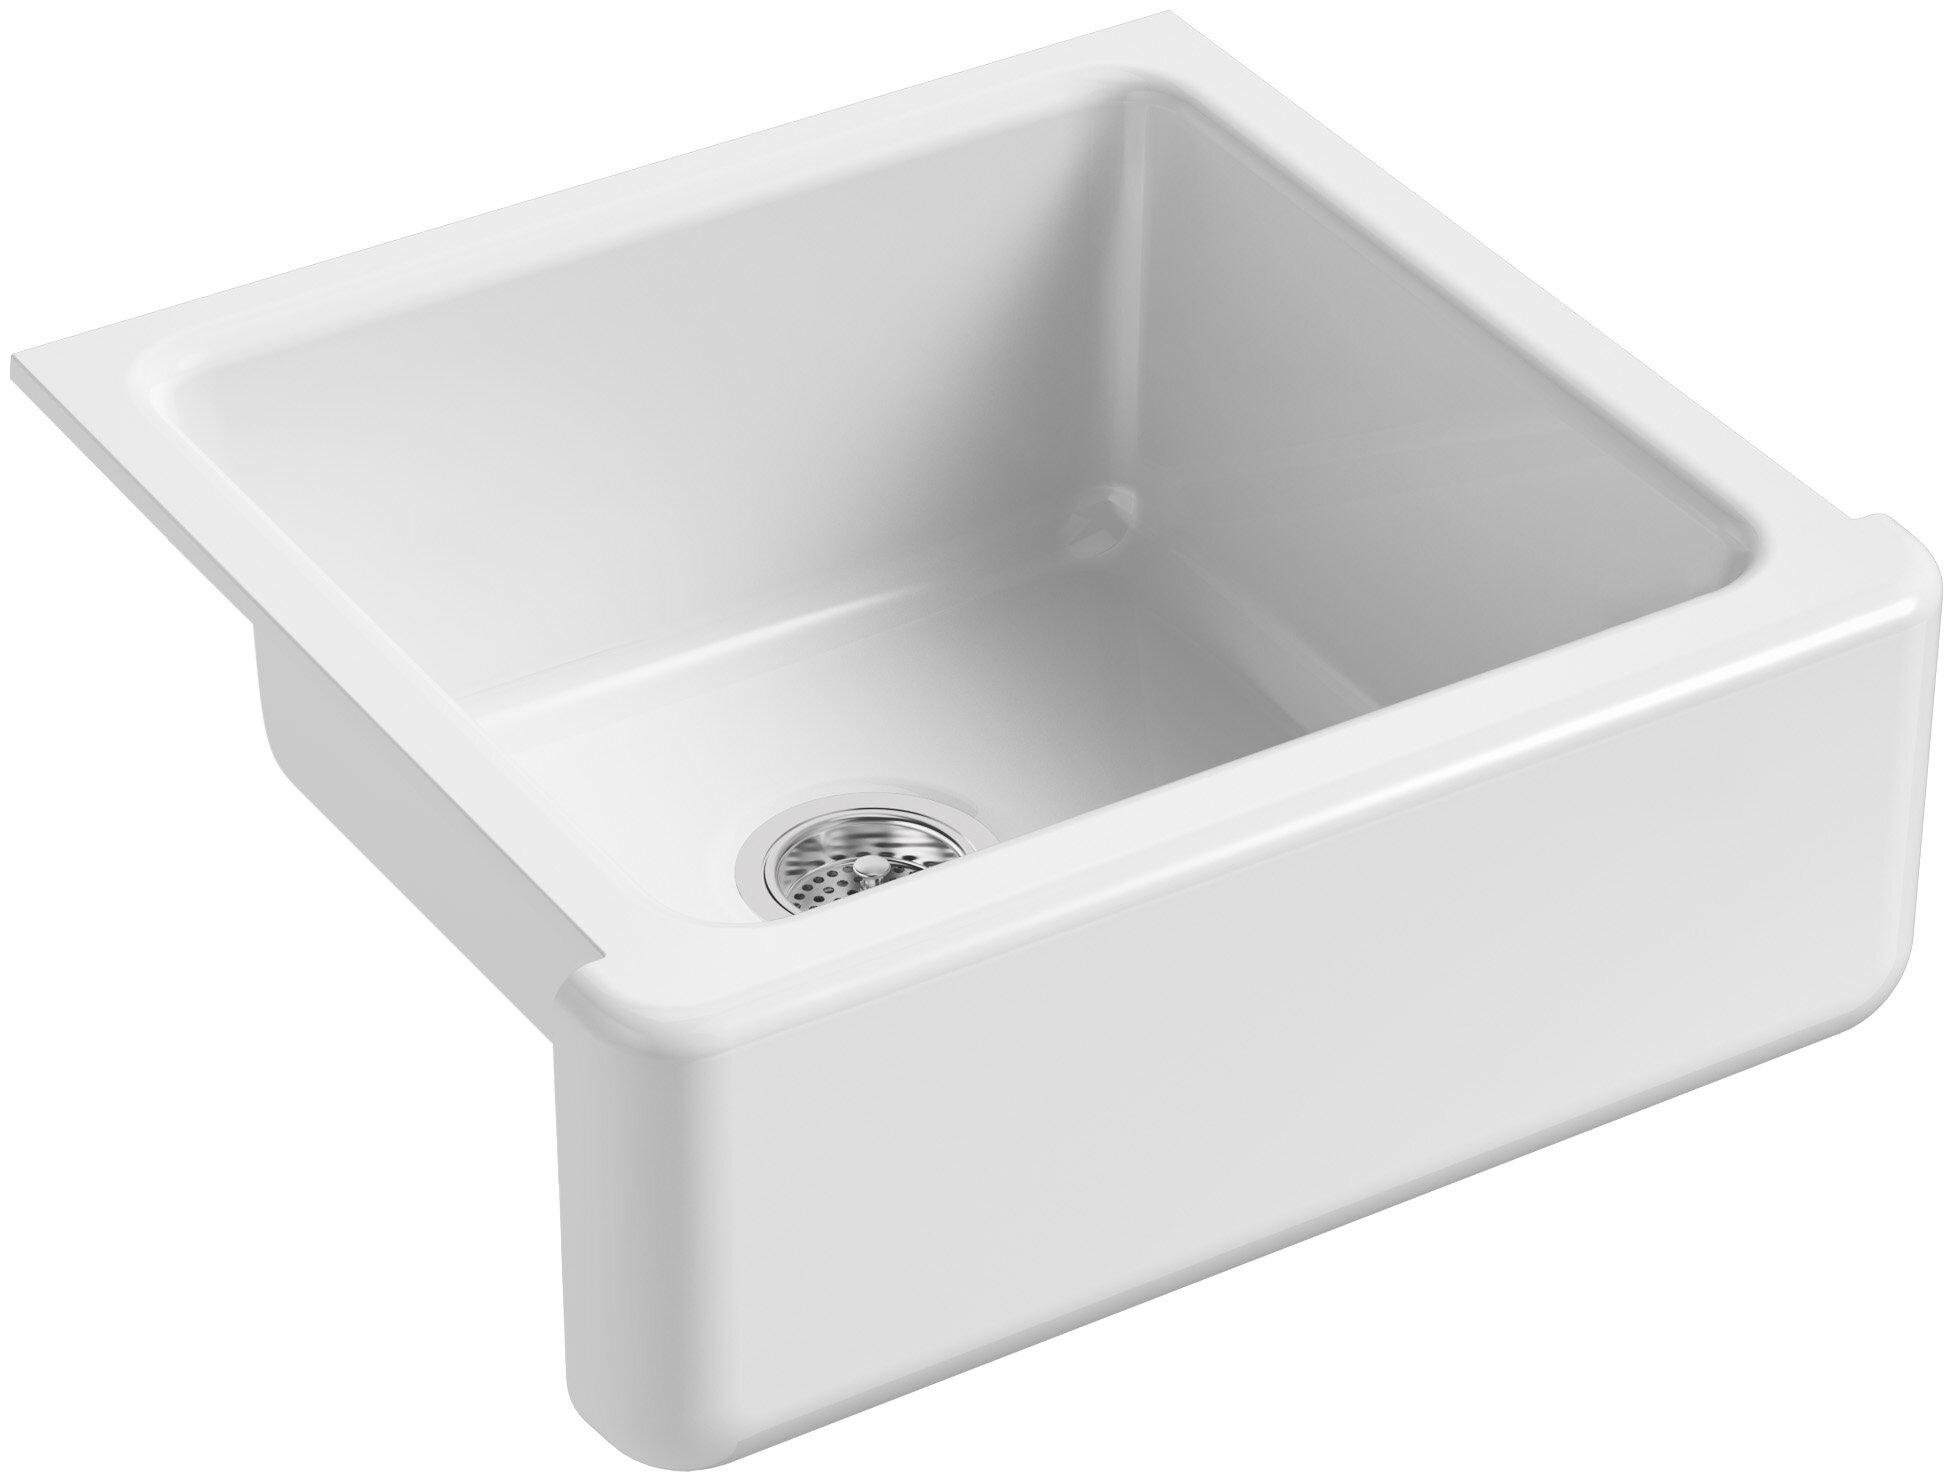 K 5665 0 Fd Kohler Whitehaven Self Trimming 24 L X 22 W Undermount Kitchen Sink Reviews Wayfair